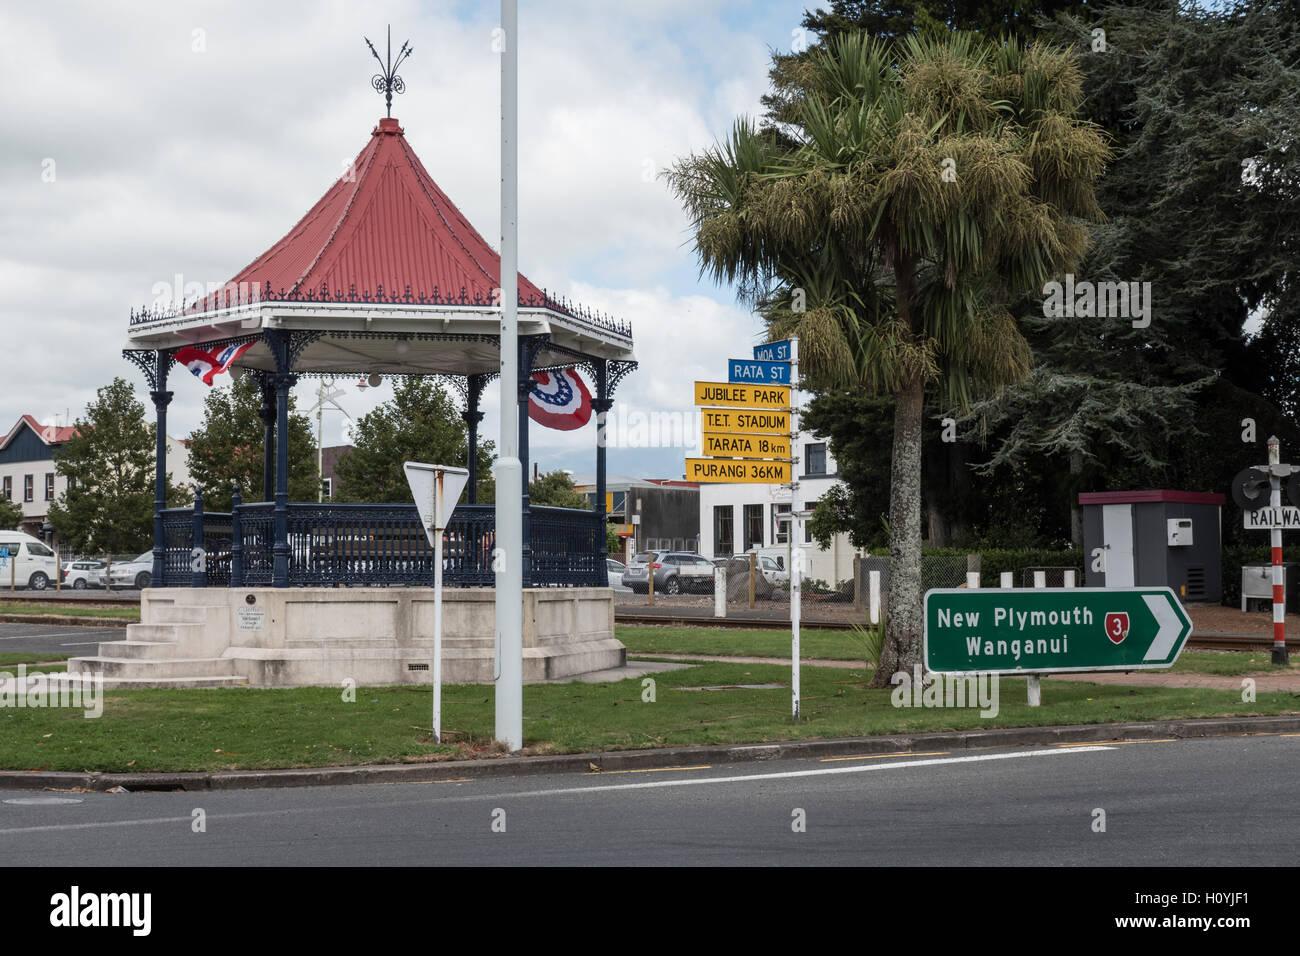 Band Stand, Inglewood, Taranaki, North Island, New Zealand. - Stock Image